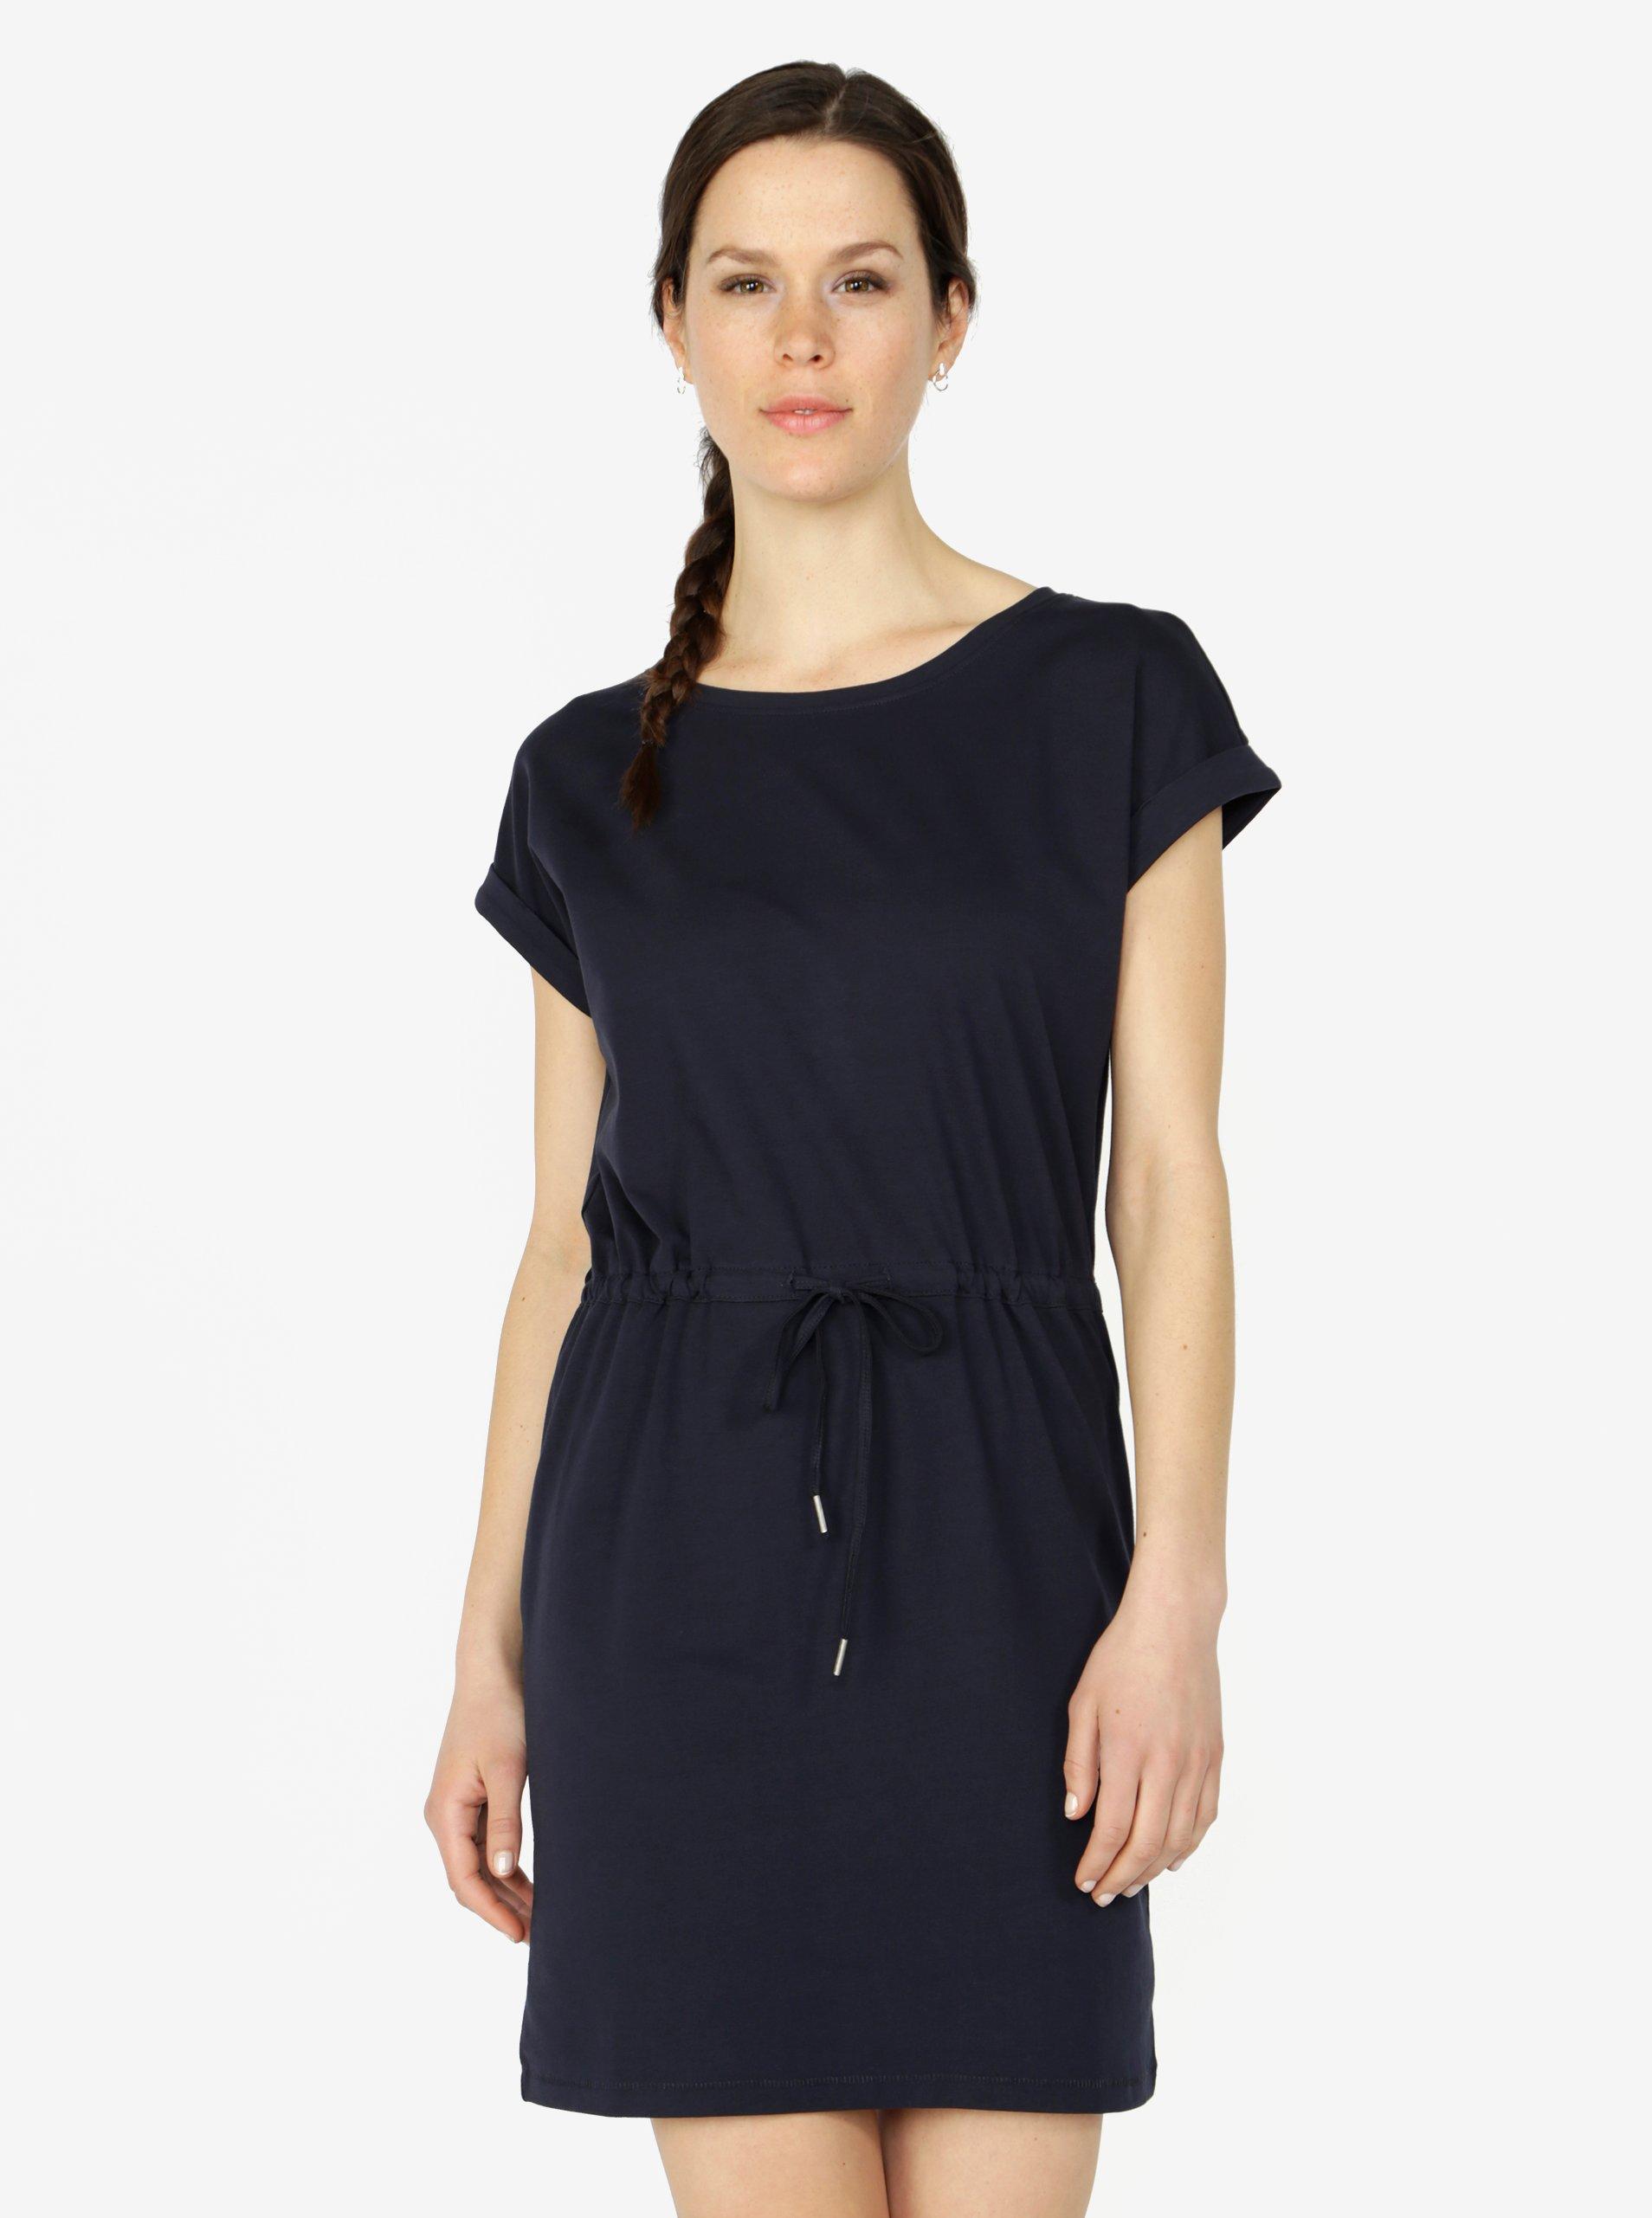 Tmavomodré šaty s krátkym rukávom ONLY Amber